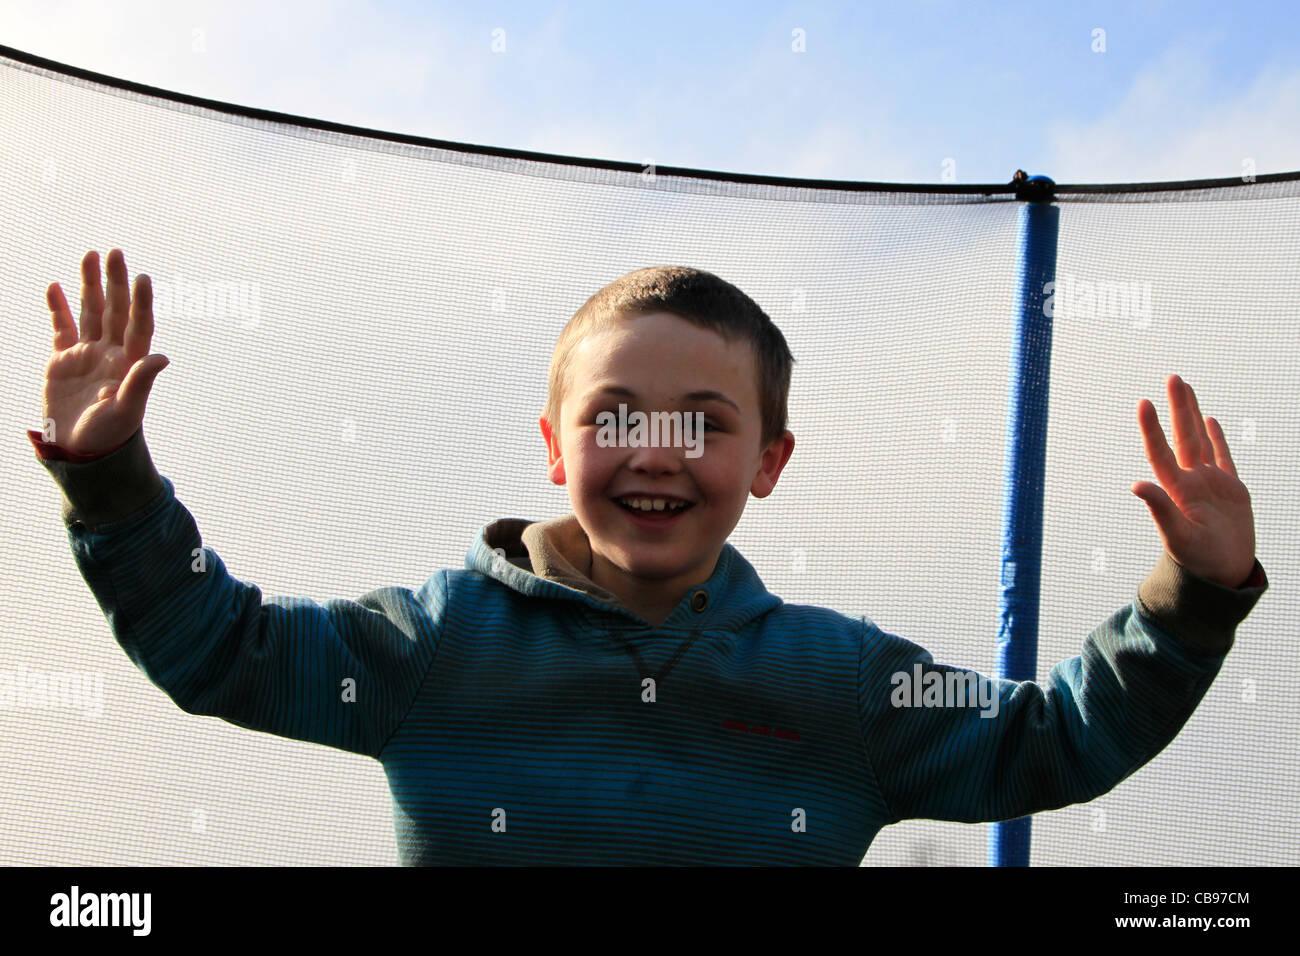 Junge auf Trampolin Stockbild